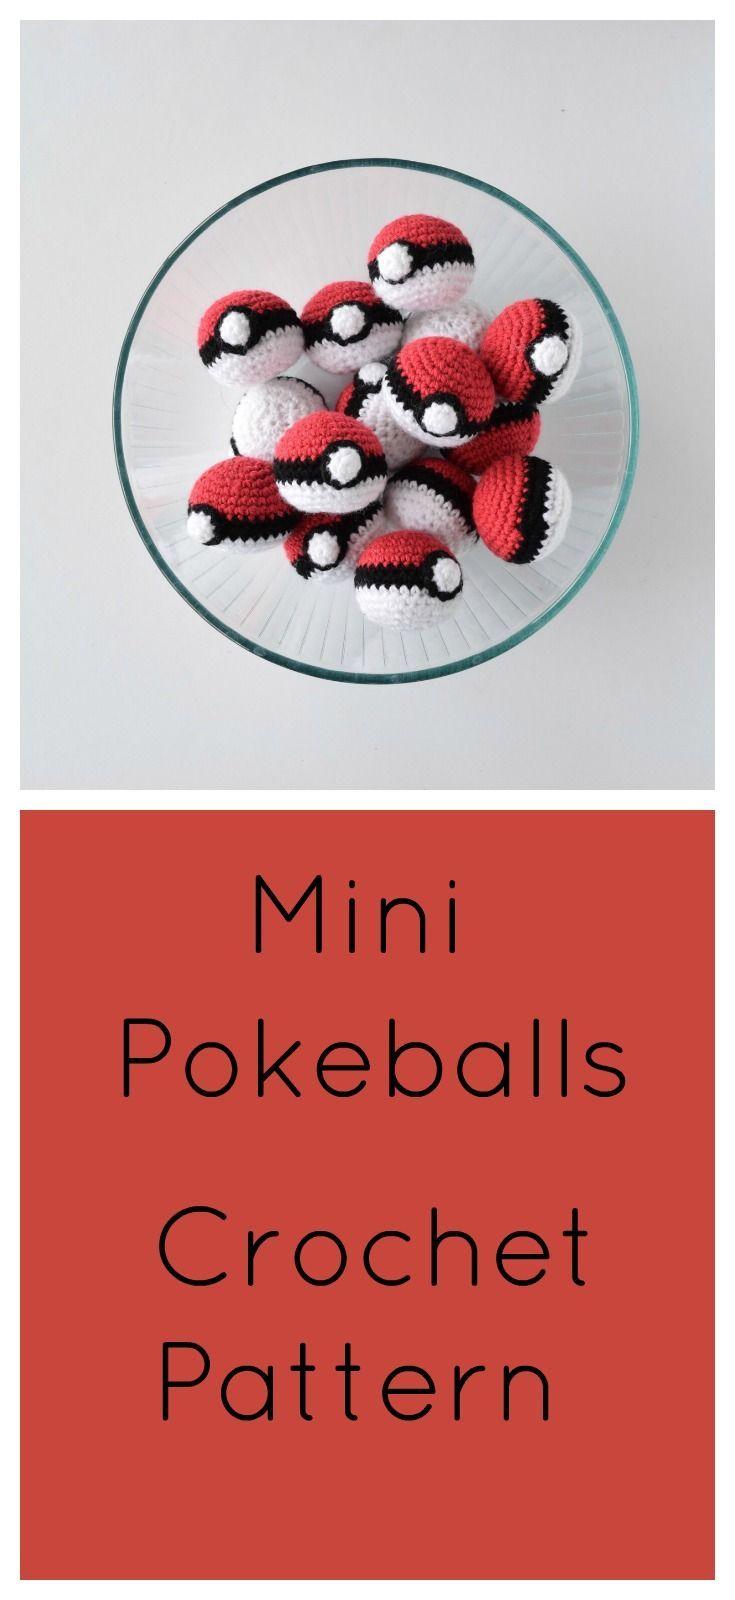 Mini Pokeballs- Free Crochet Pattern